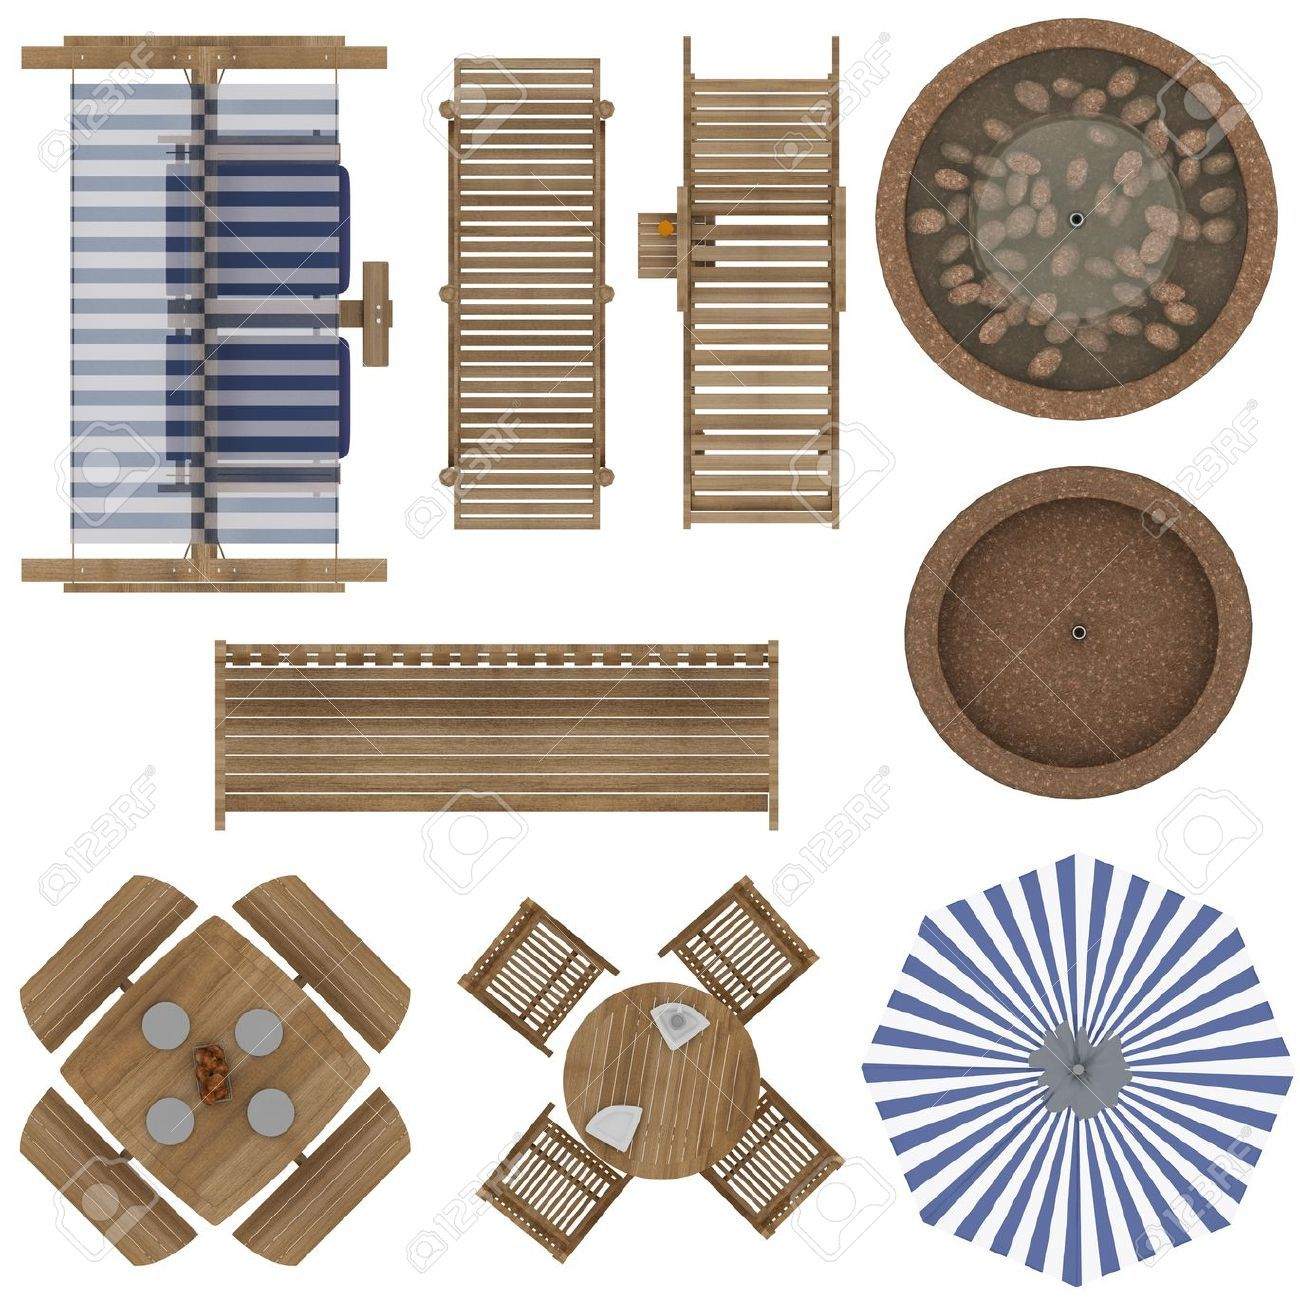 Landscaping furniture plan view google search